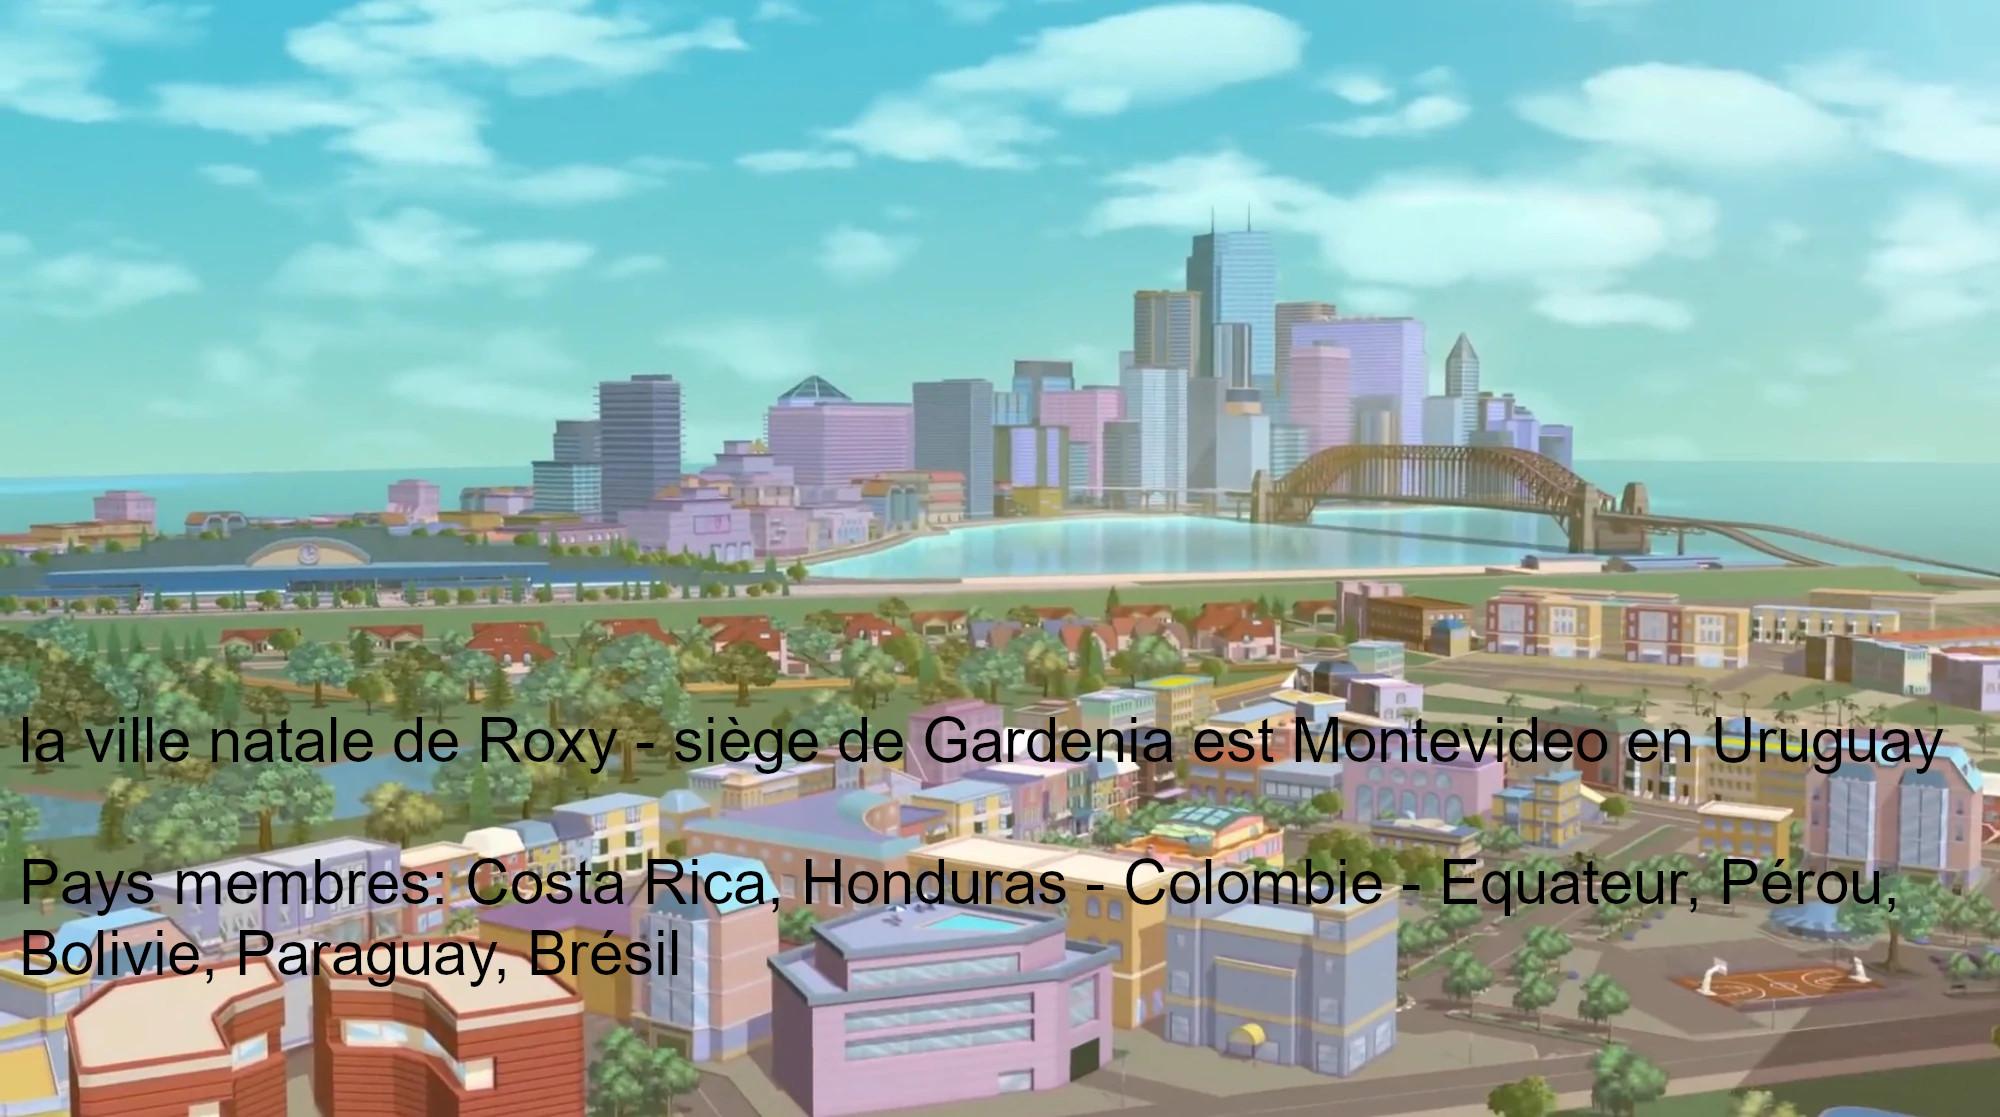 Gadenia ( Costa Rica, Colombie, Honduras, Brésil, Paraguay, Uruguay, Bolivie, Pérou )